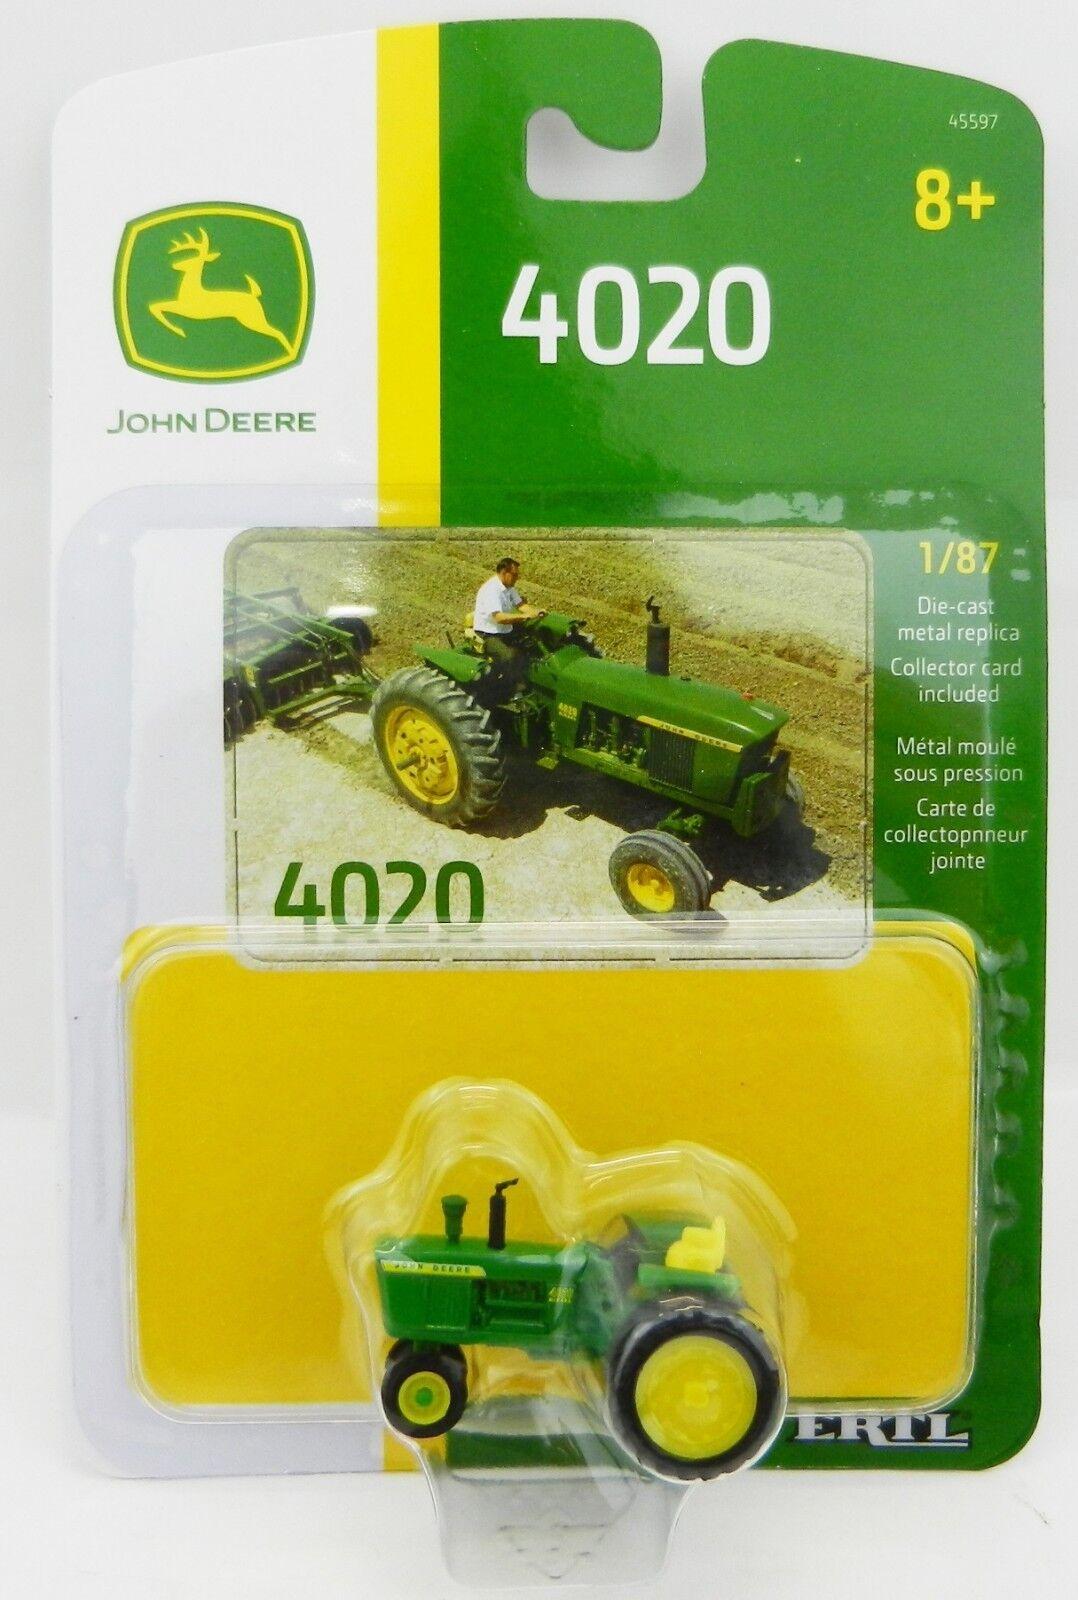 Ertl Collectibles 4020 John Deere Metall Traktor 1:87 HO Maßstab